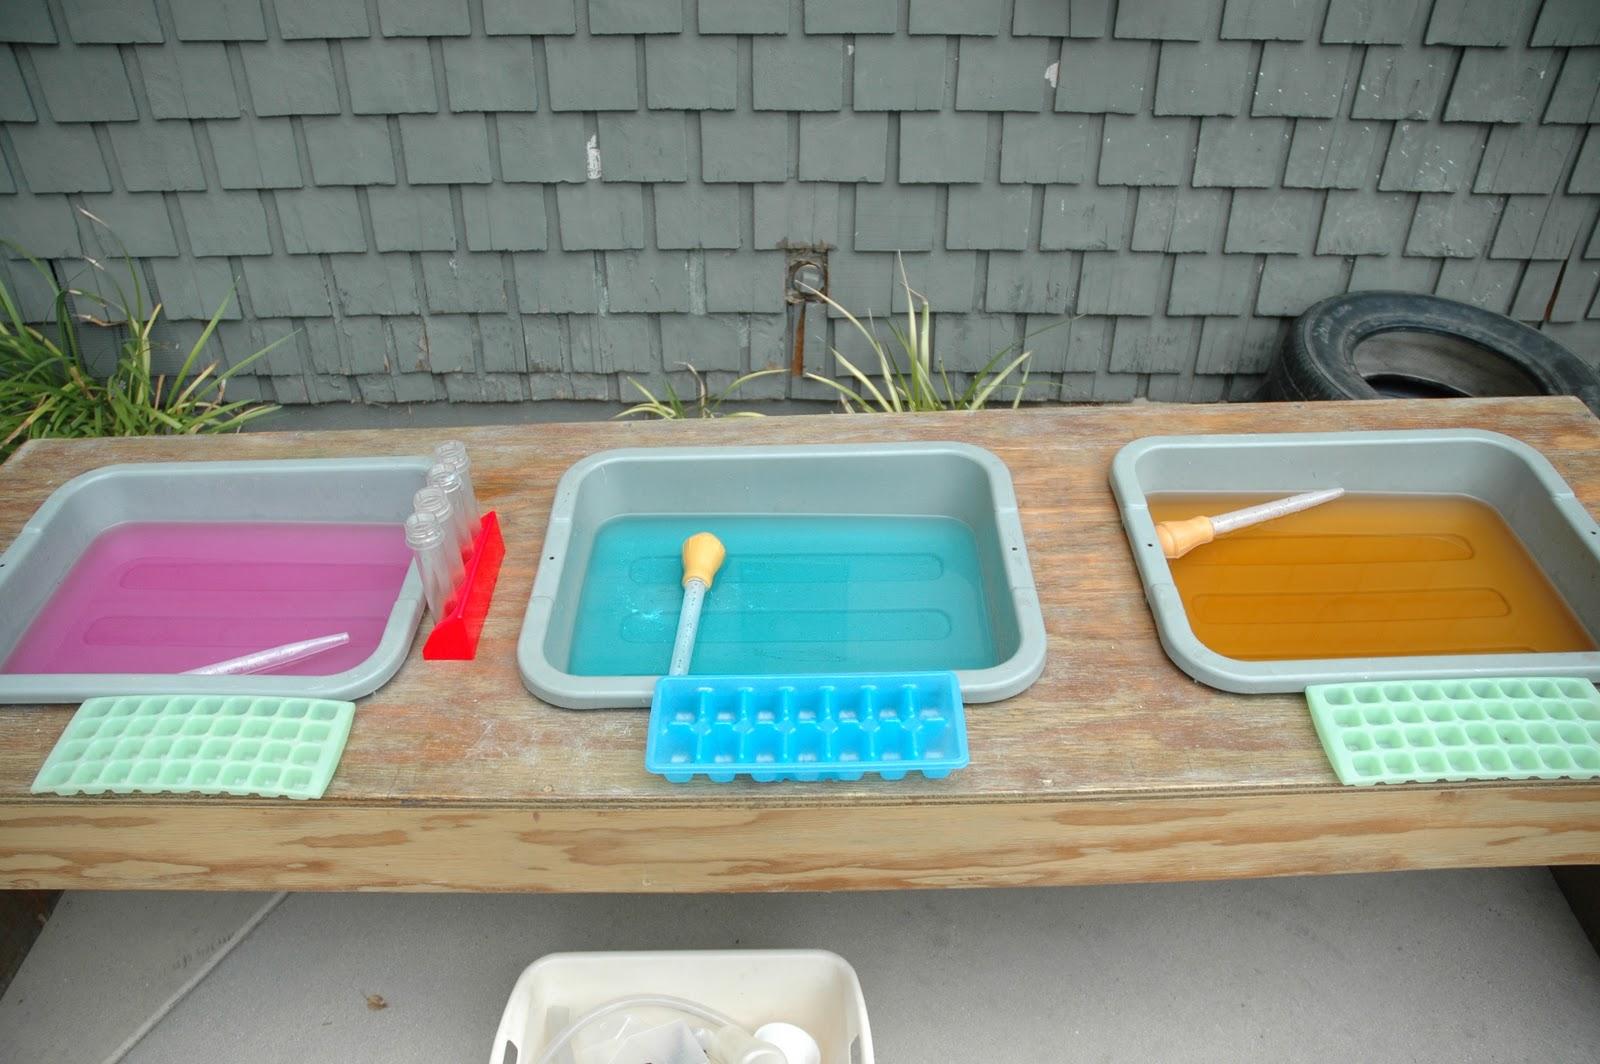 Outdoor Classroom Ideas Year 1 ~ Exploring the outdoor classroom paleontology preschool